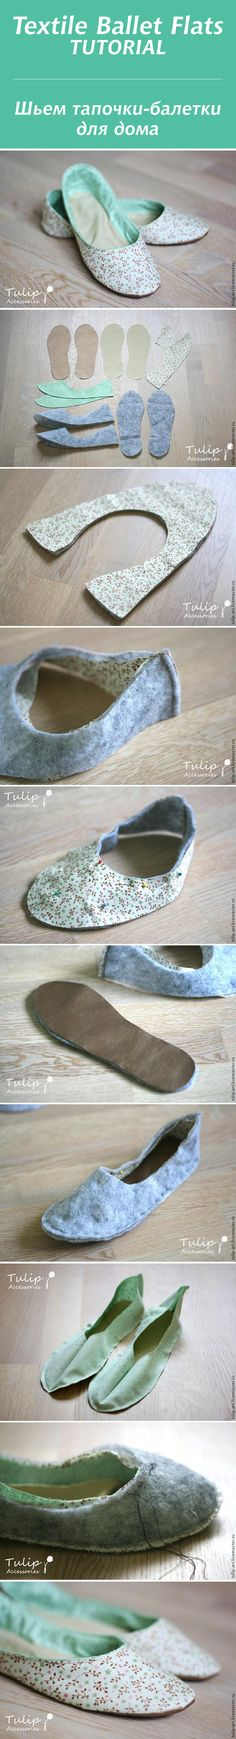 Fabric Ballet Flats Tutorial / Шьем тапочки-балетки для дома #sewing #diy